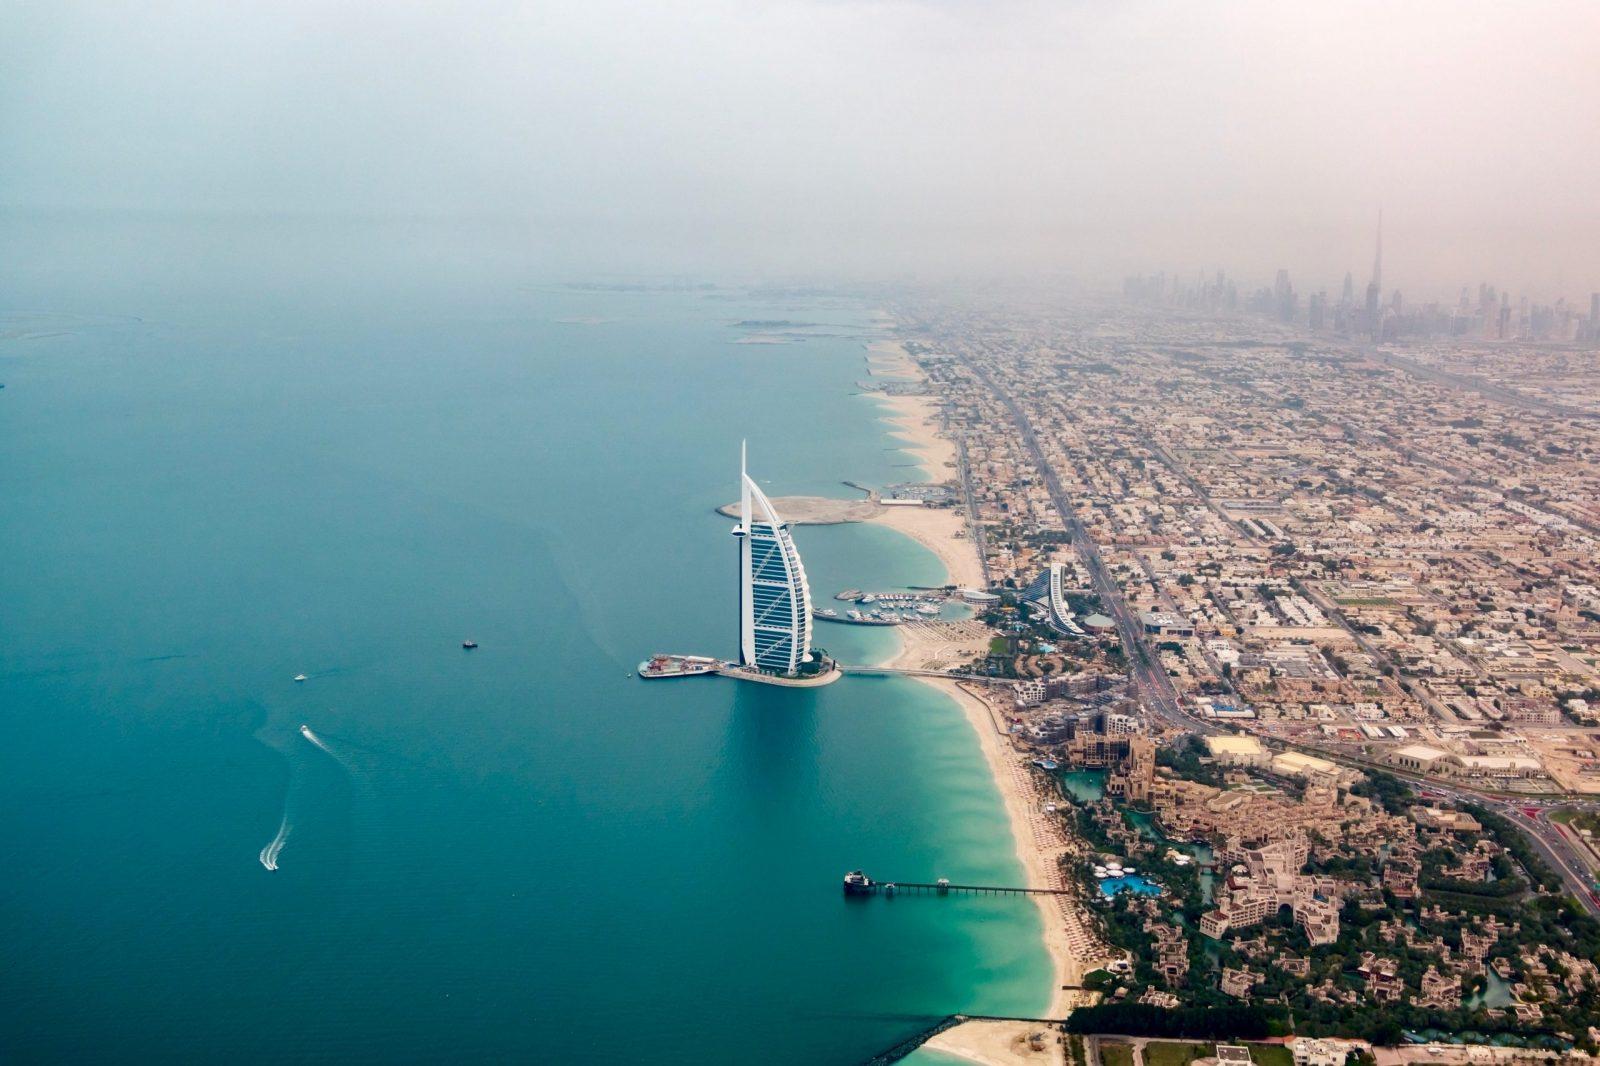 Private Tutor Dubai